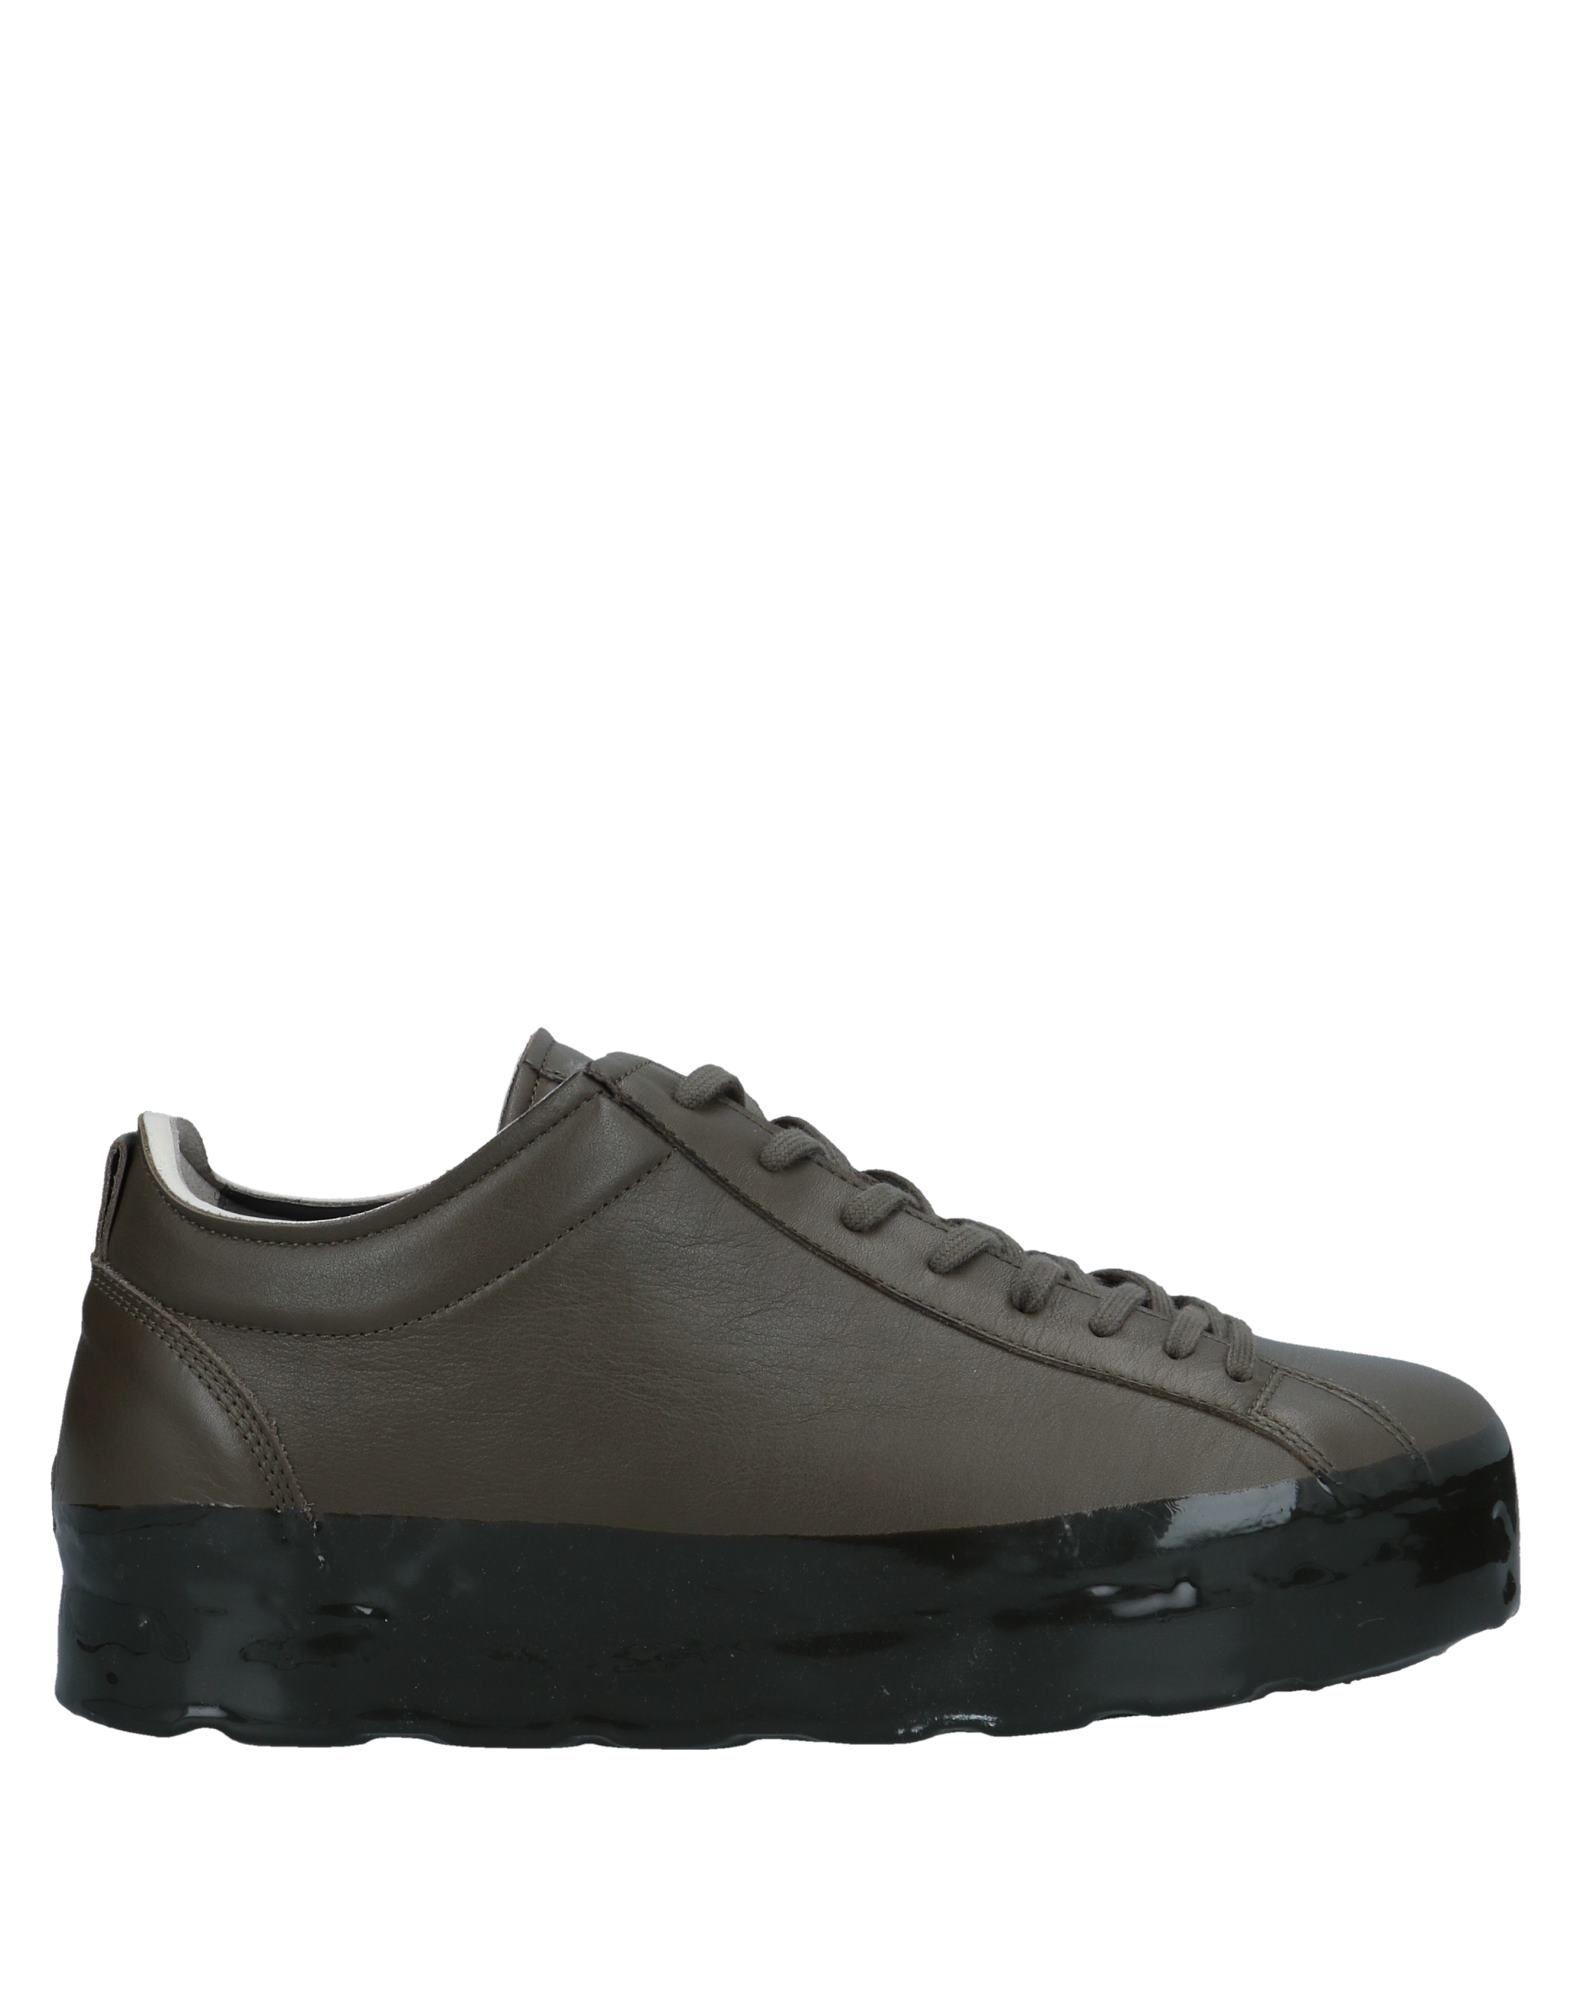 O.X.S. Rubber Soul Sneakers - Men O.X.S. Rubber  Soul Sneakers online on  Rubber Canada - 11555083QT 4b77b6